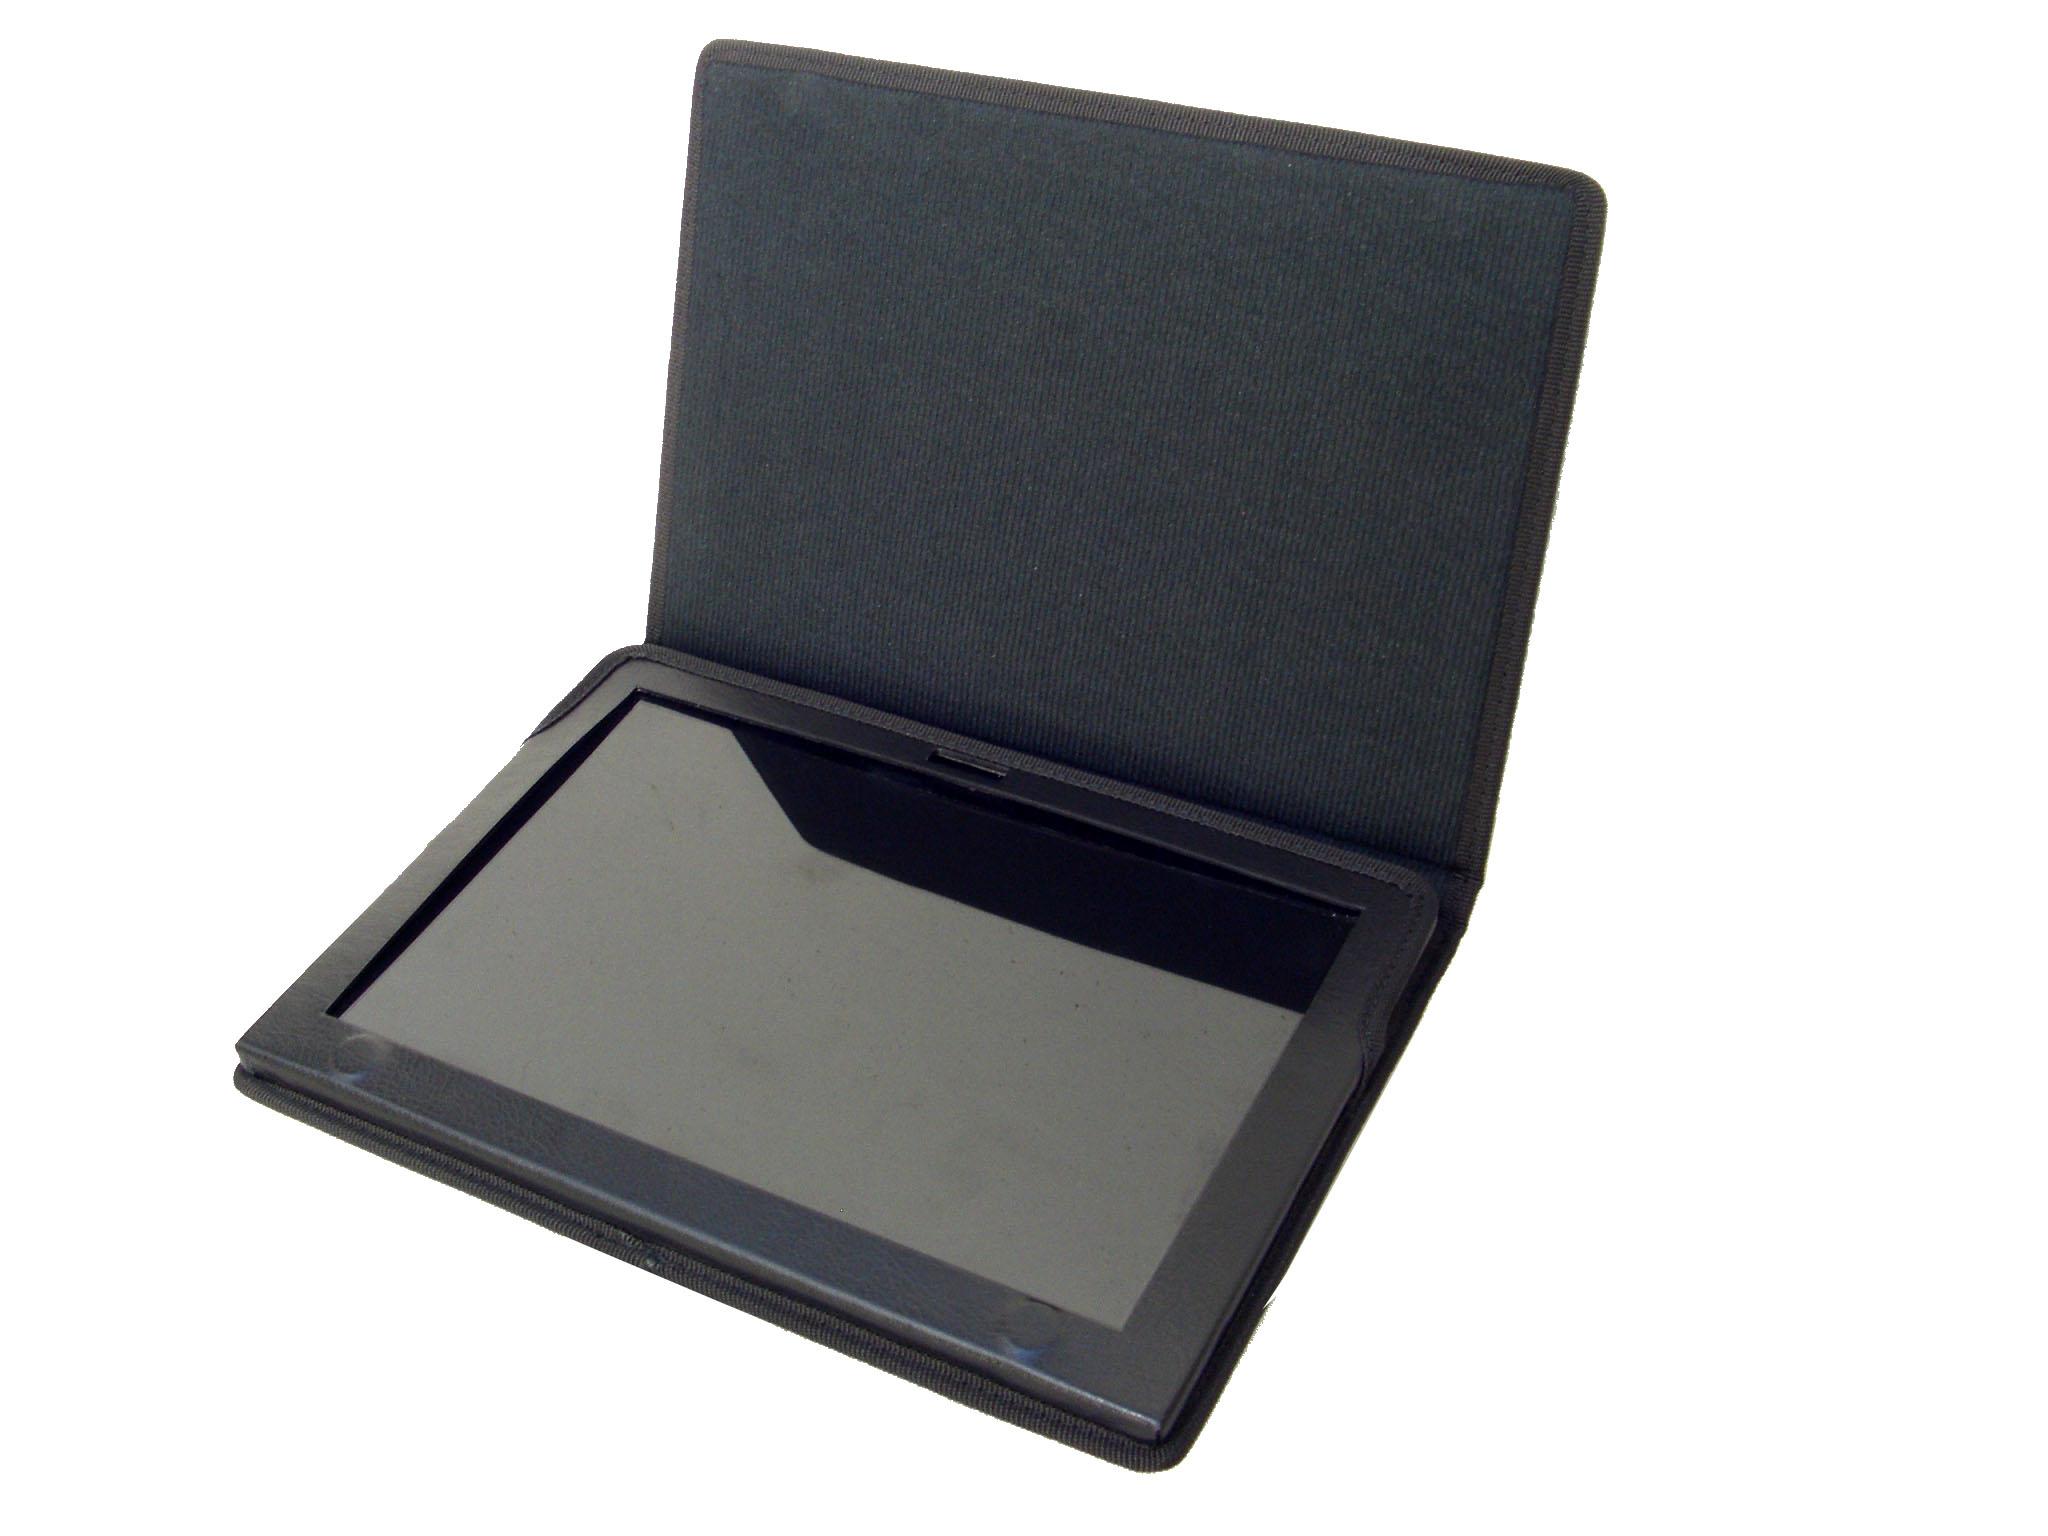 Lenovo-thinkpad-helix-Tablet-Case-open